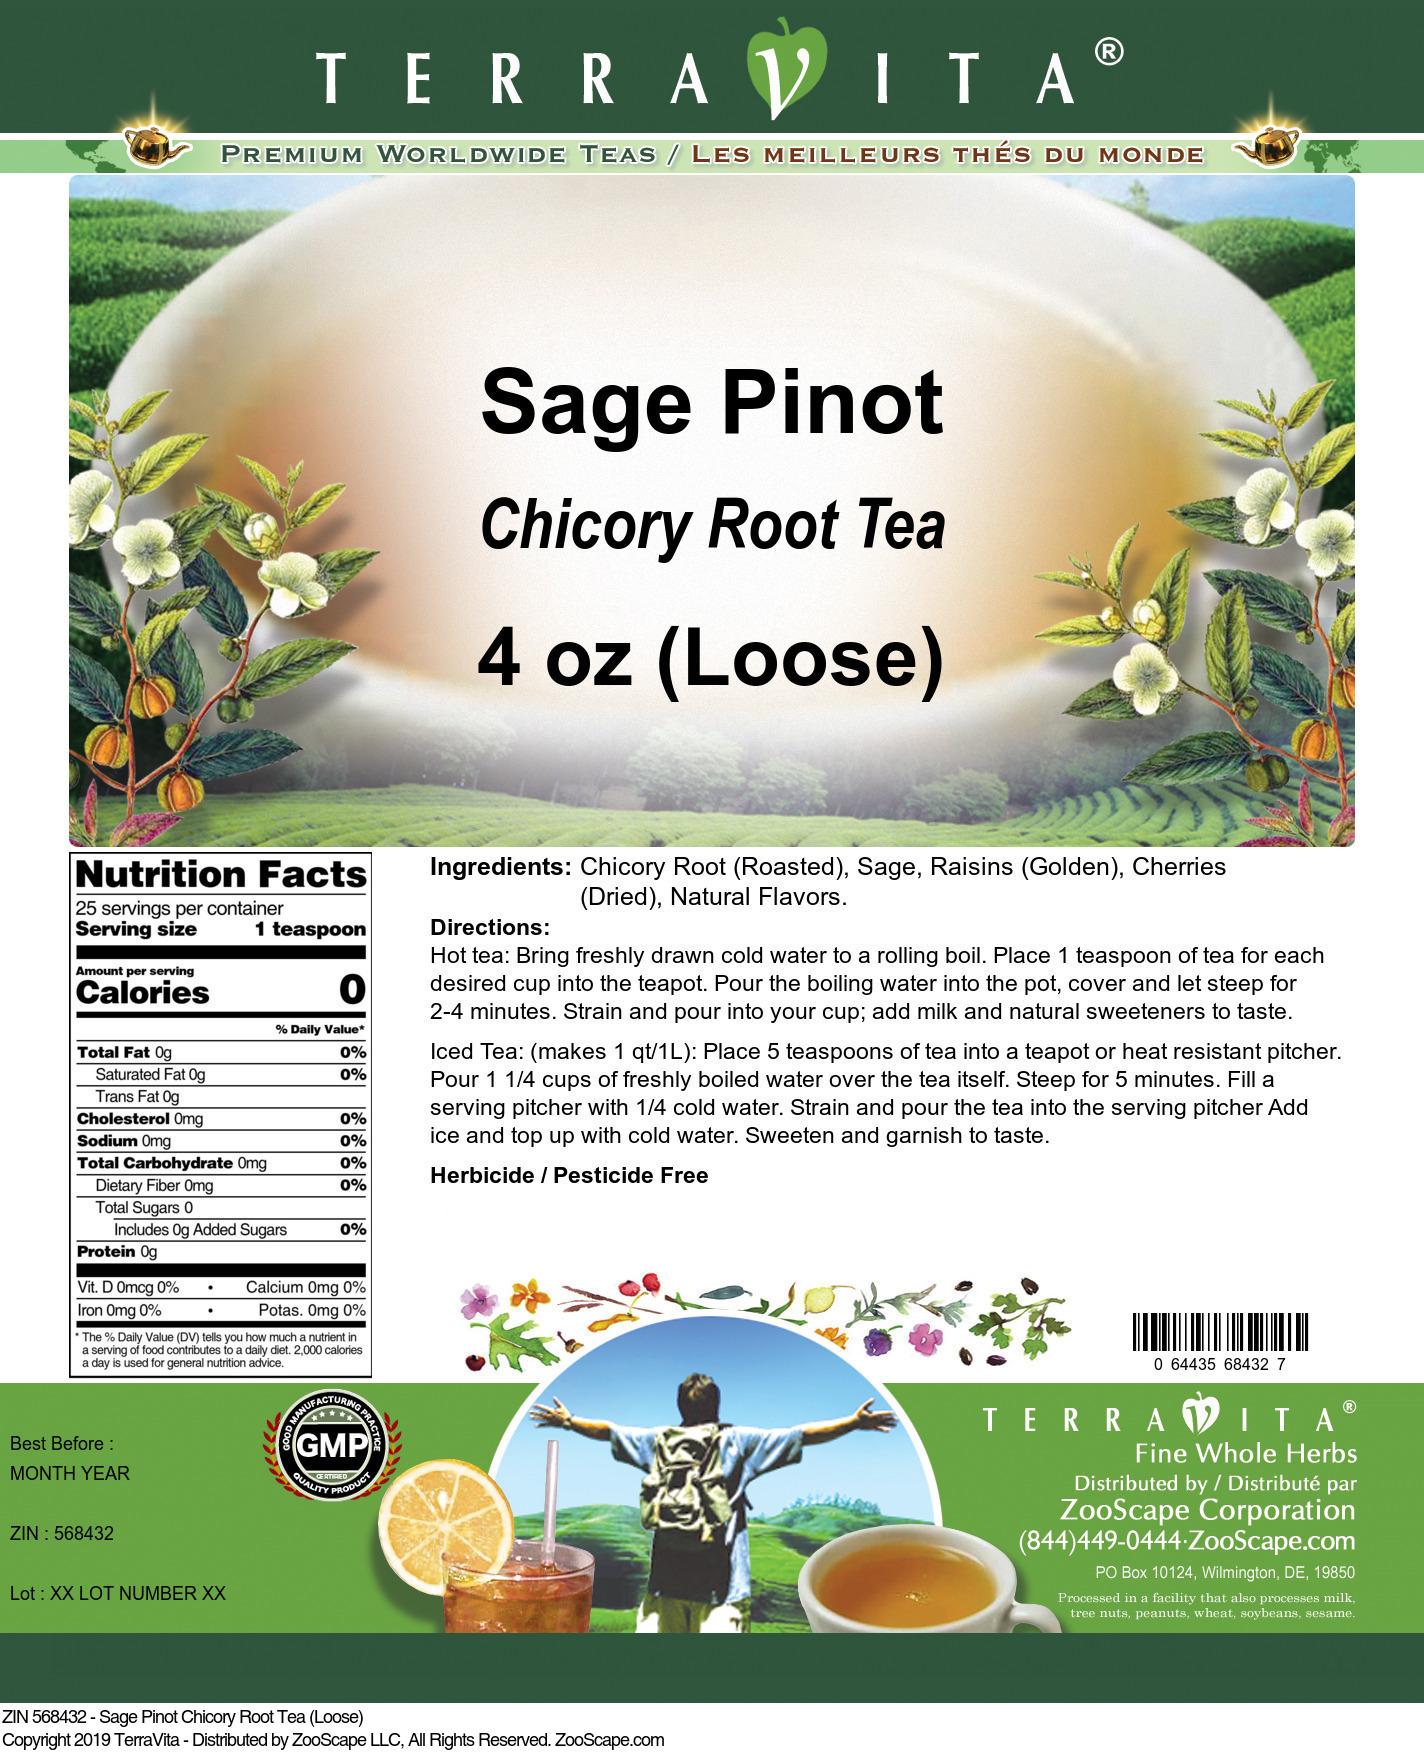 Sage Pinot Chicory Root Tea (Loose)